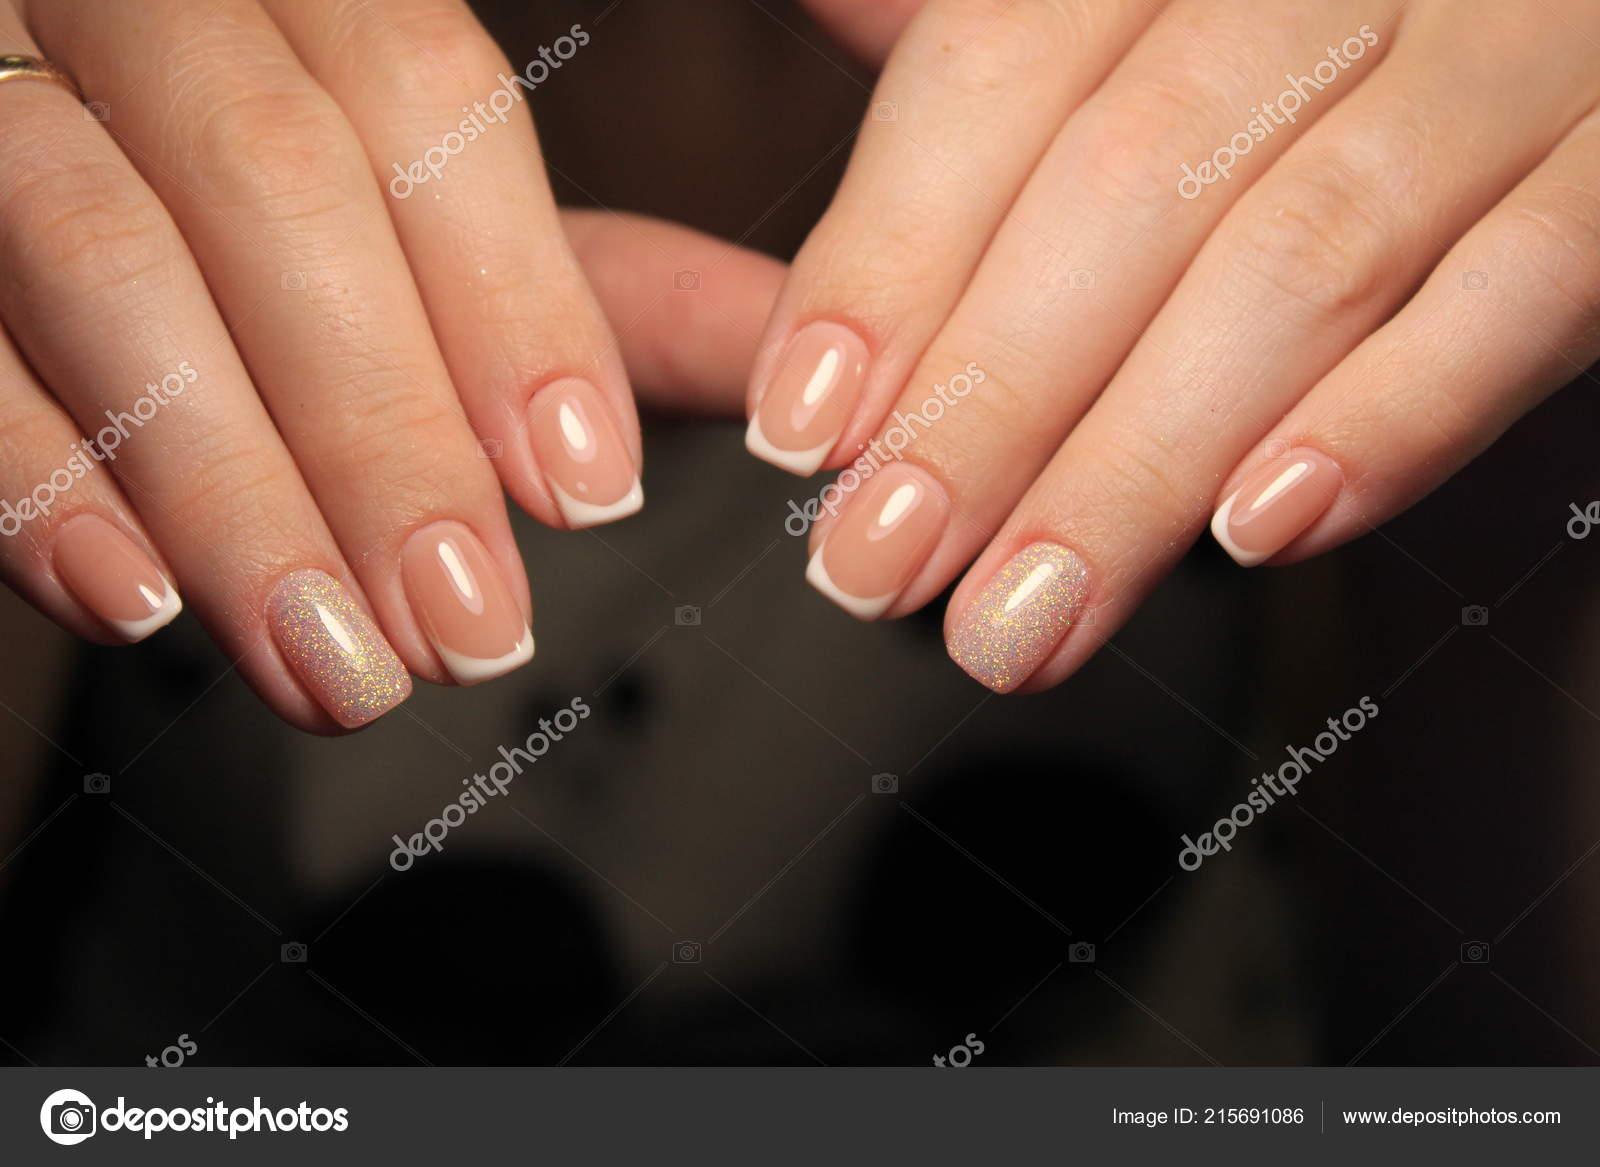 stilvolle manik re n gel farbe schwarz und silber stockfoto smirmaxstock 215691086. Black Bedroom Furniture Sets. Home Design Ideas